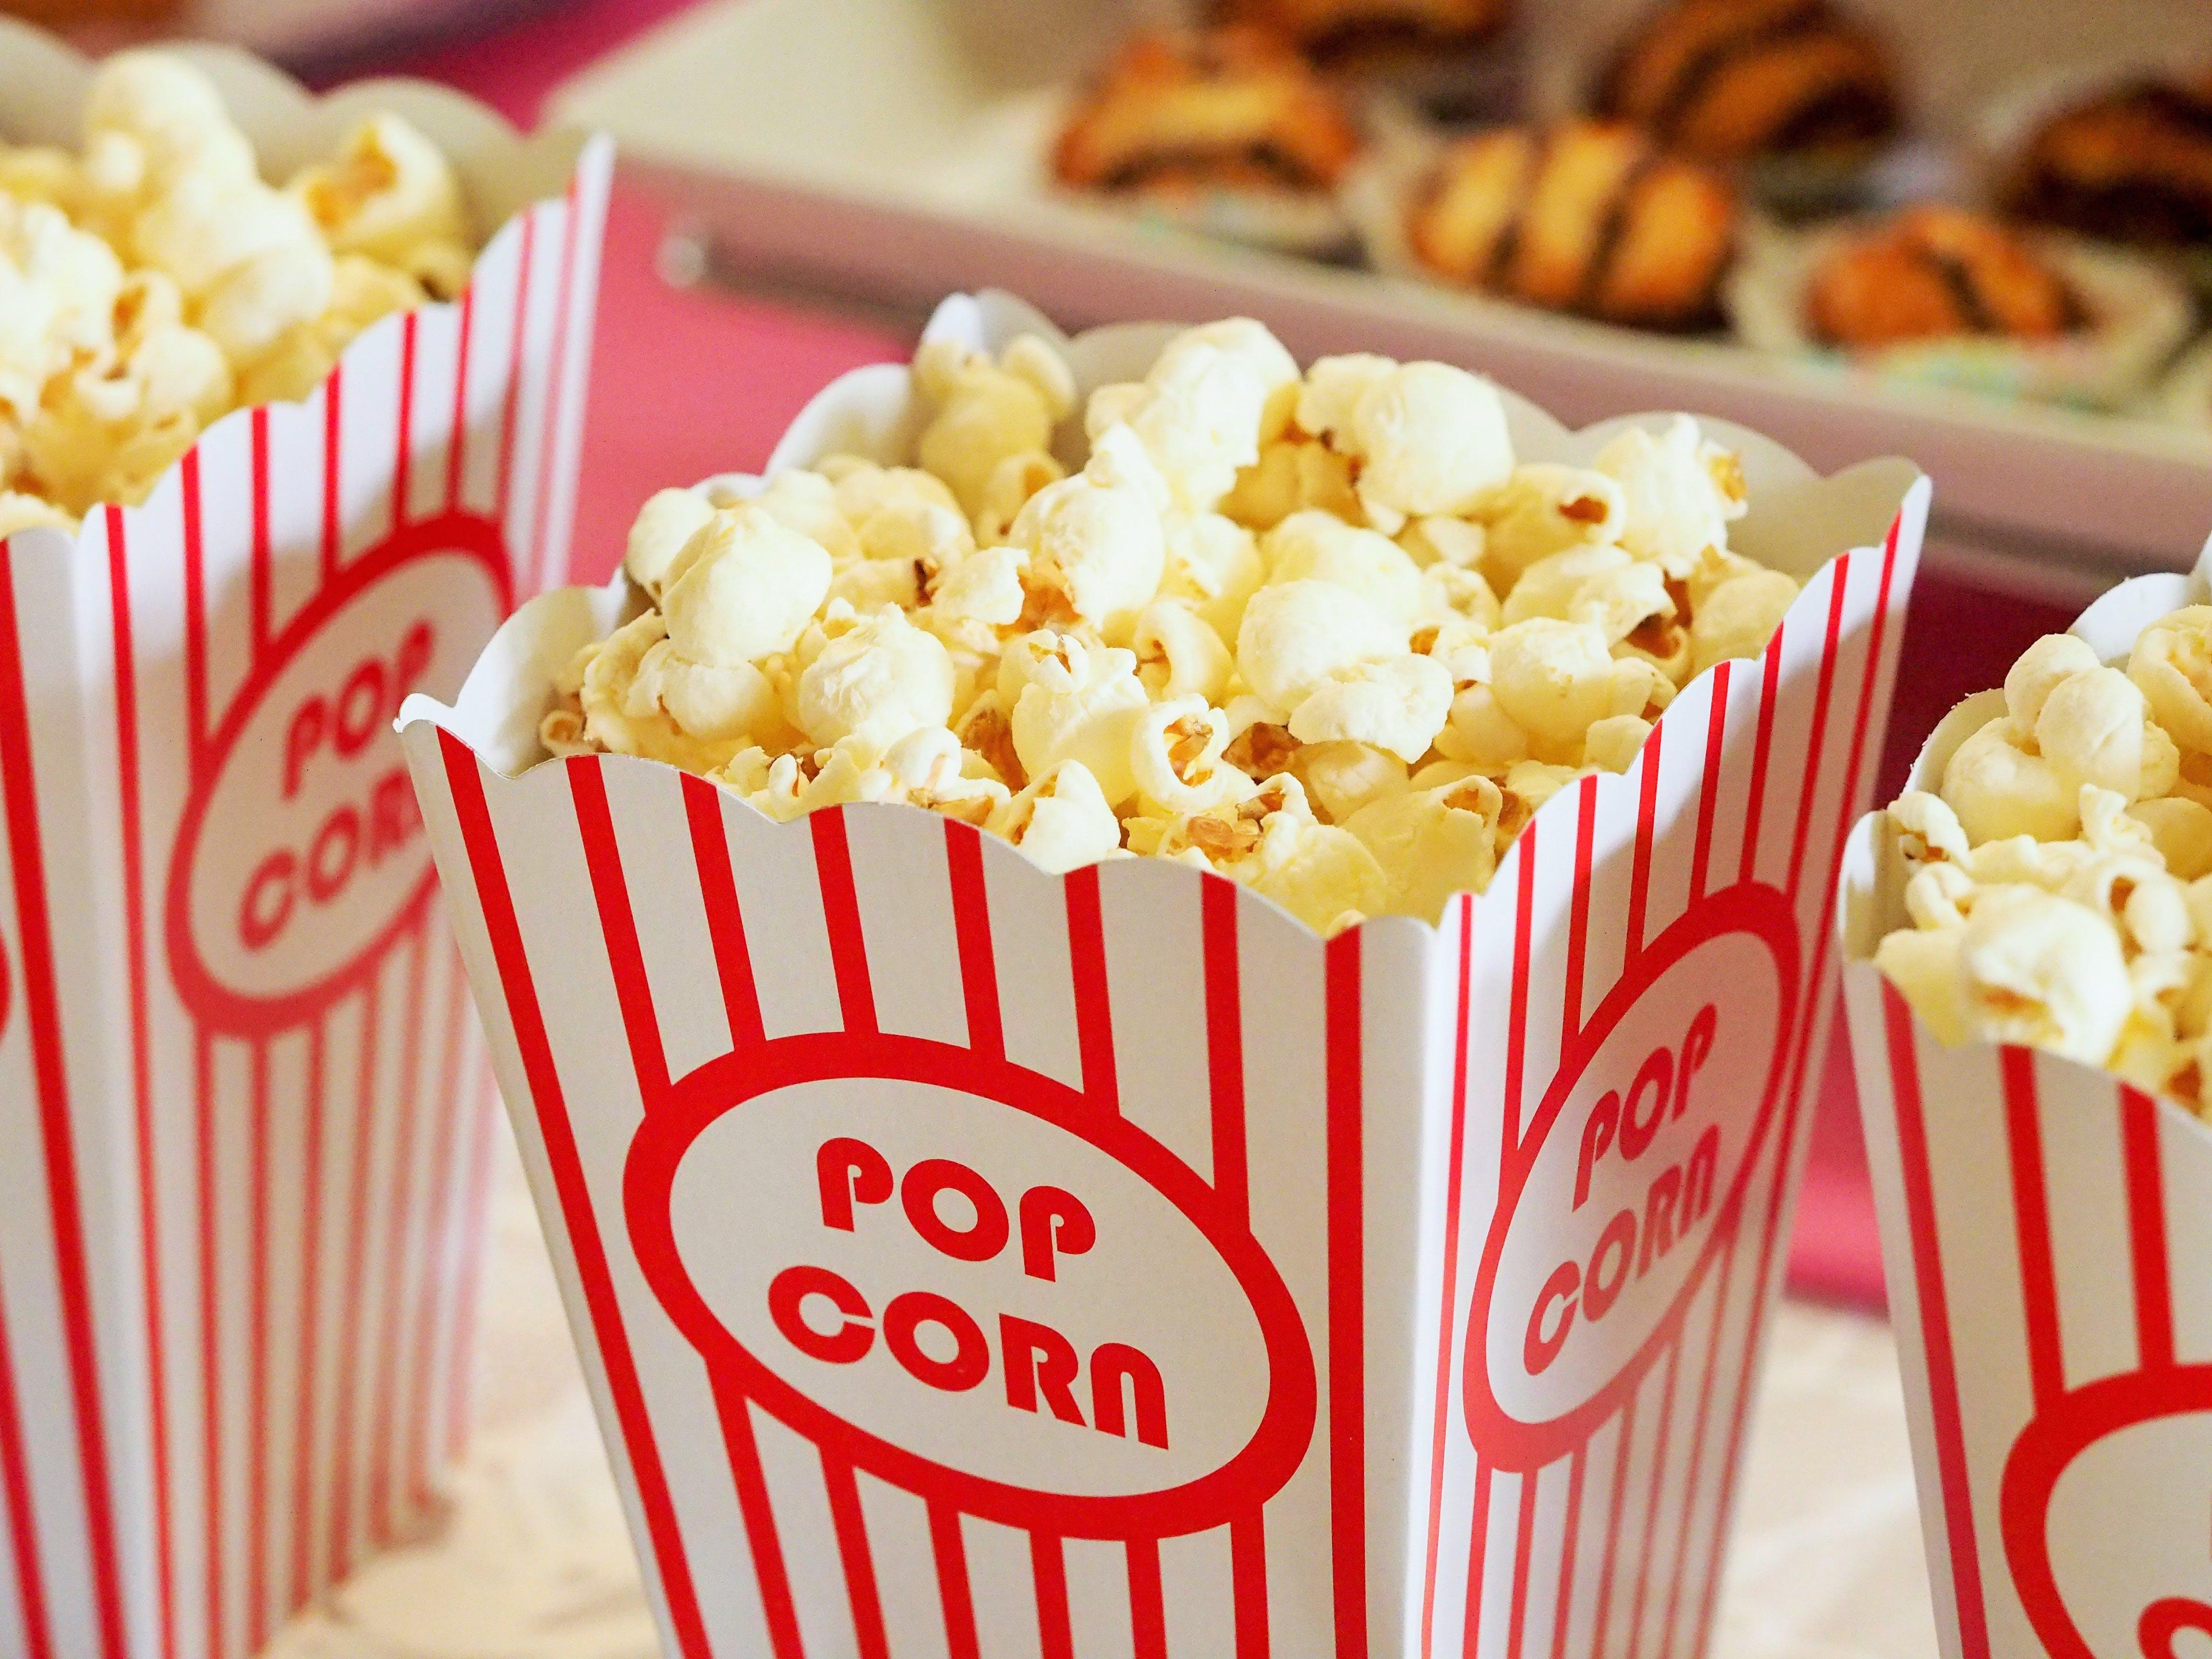 Kostenloses Stock Foto zu essen, kino, popcorn, salzige popcorn